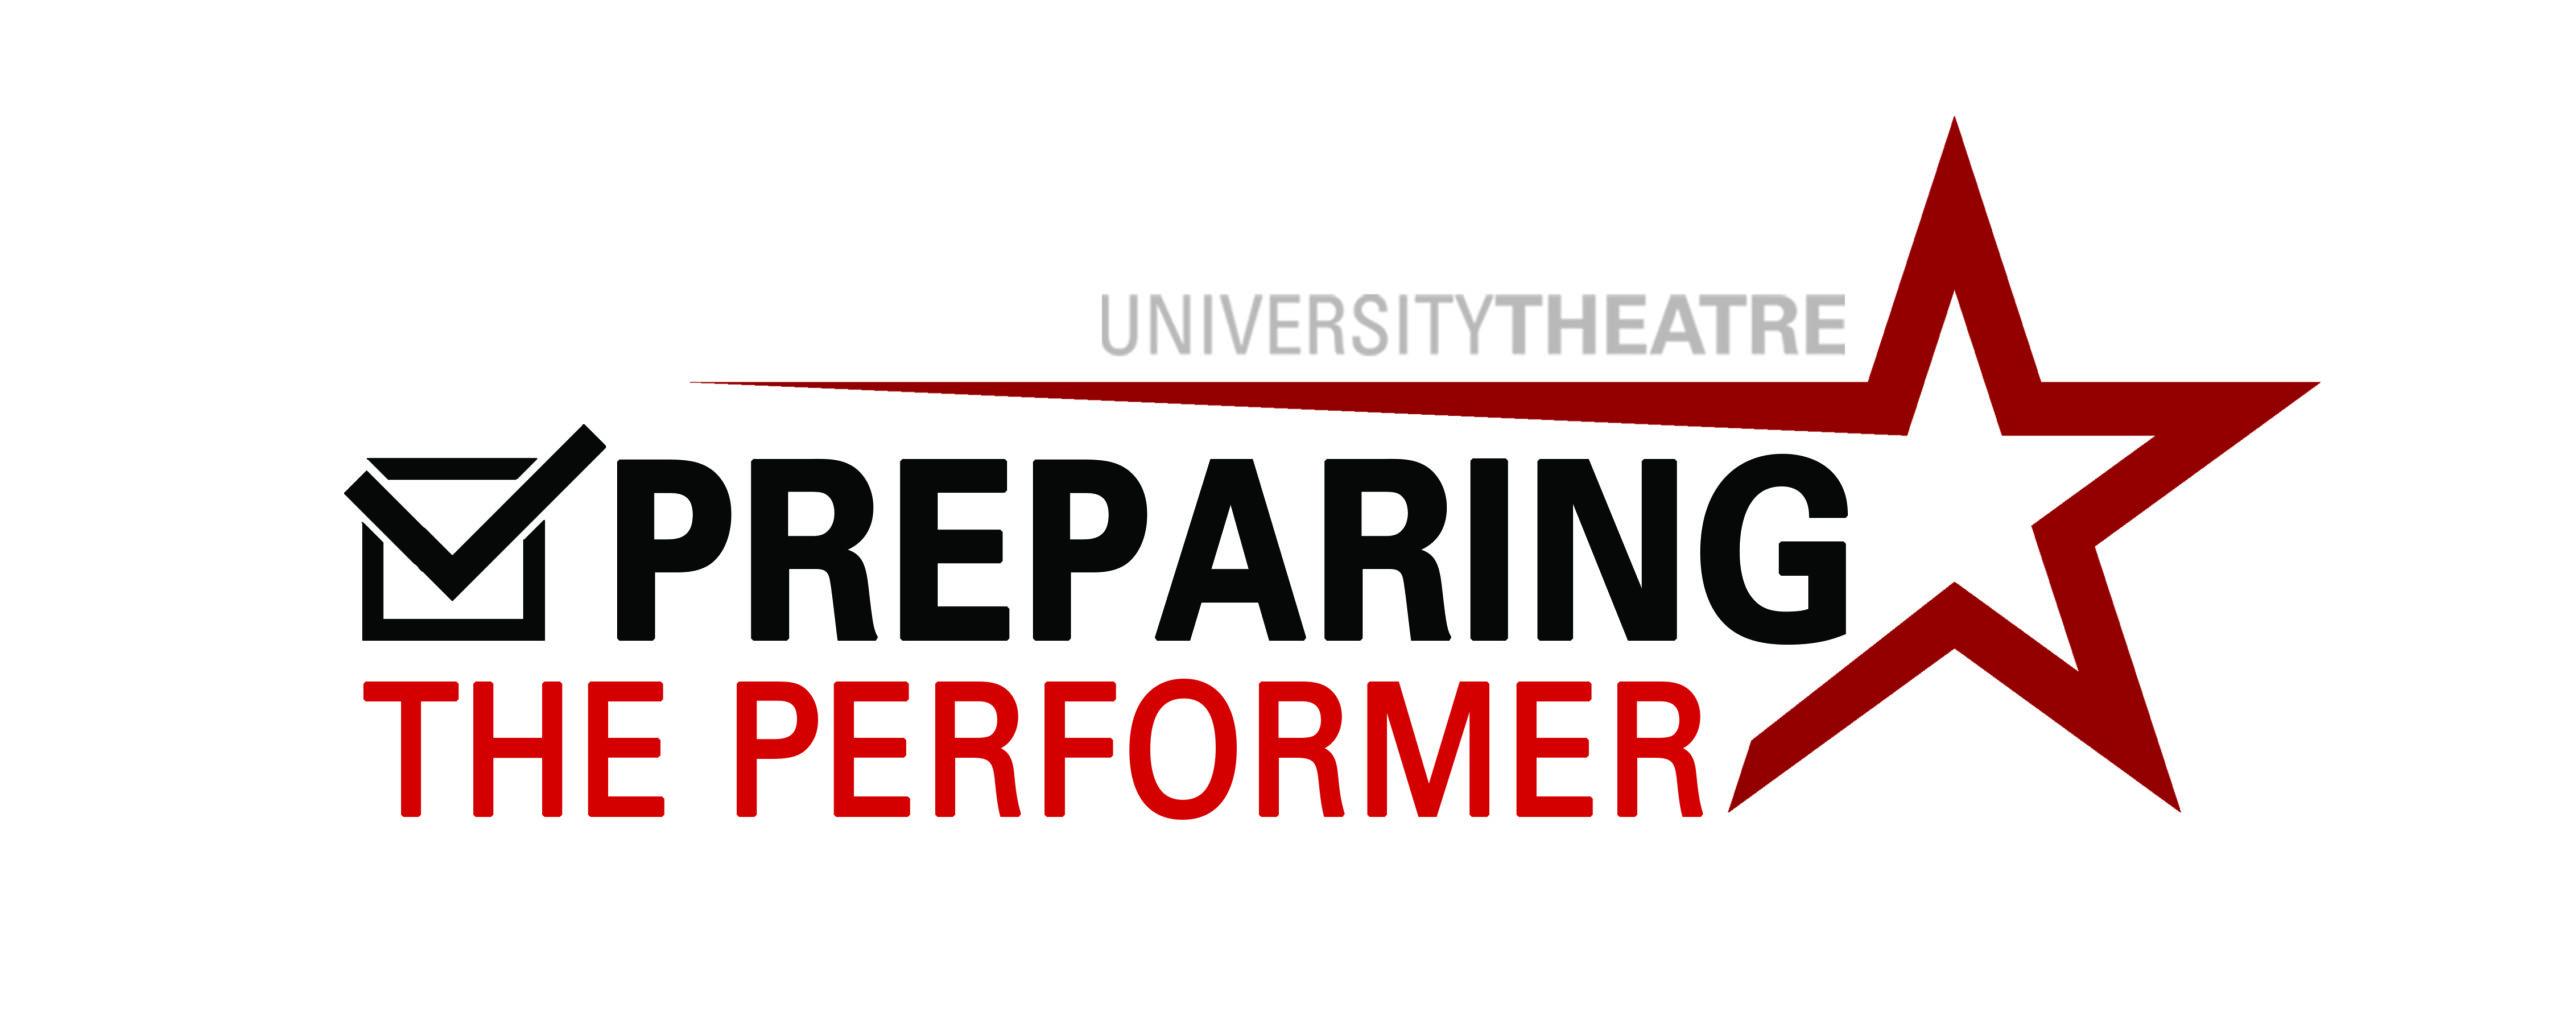 Preparing the Performer